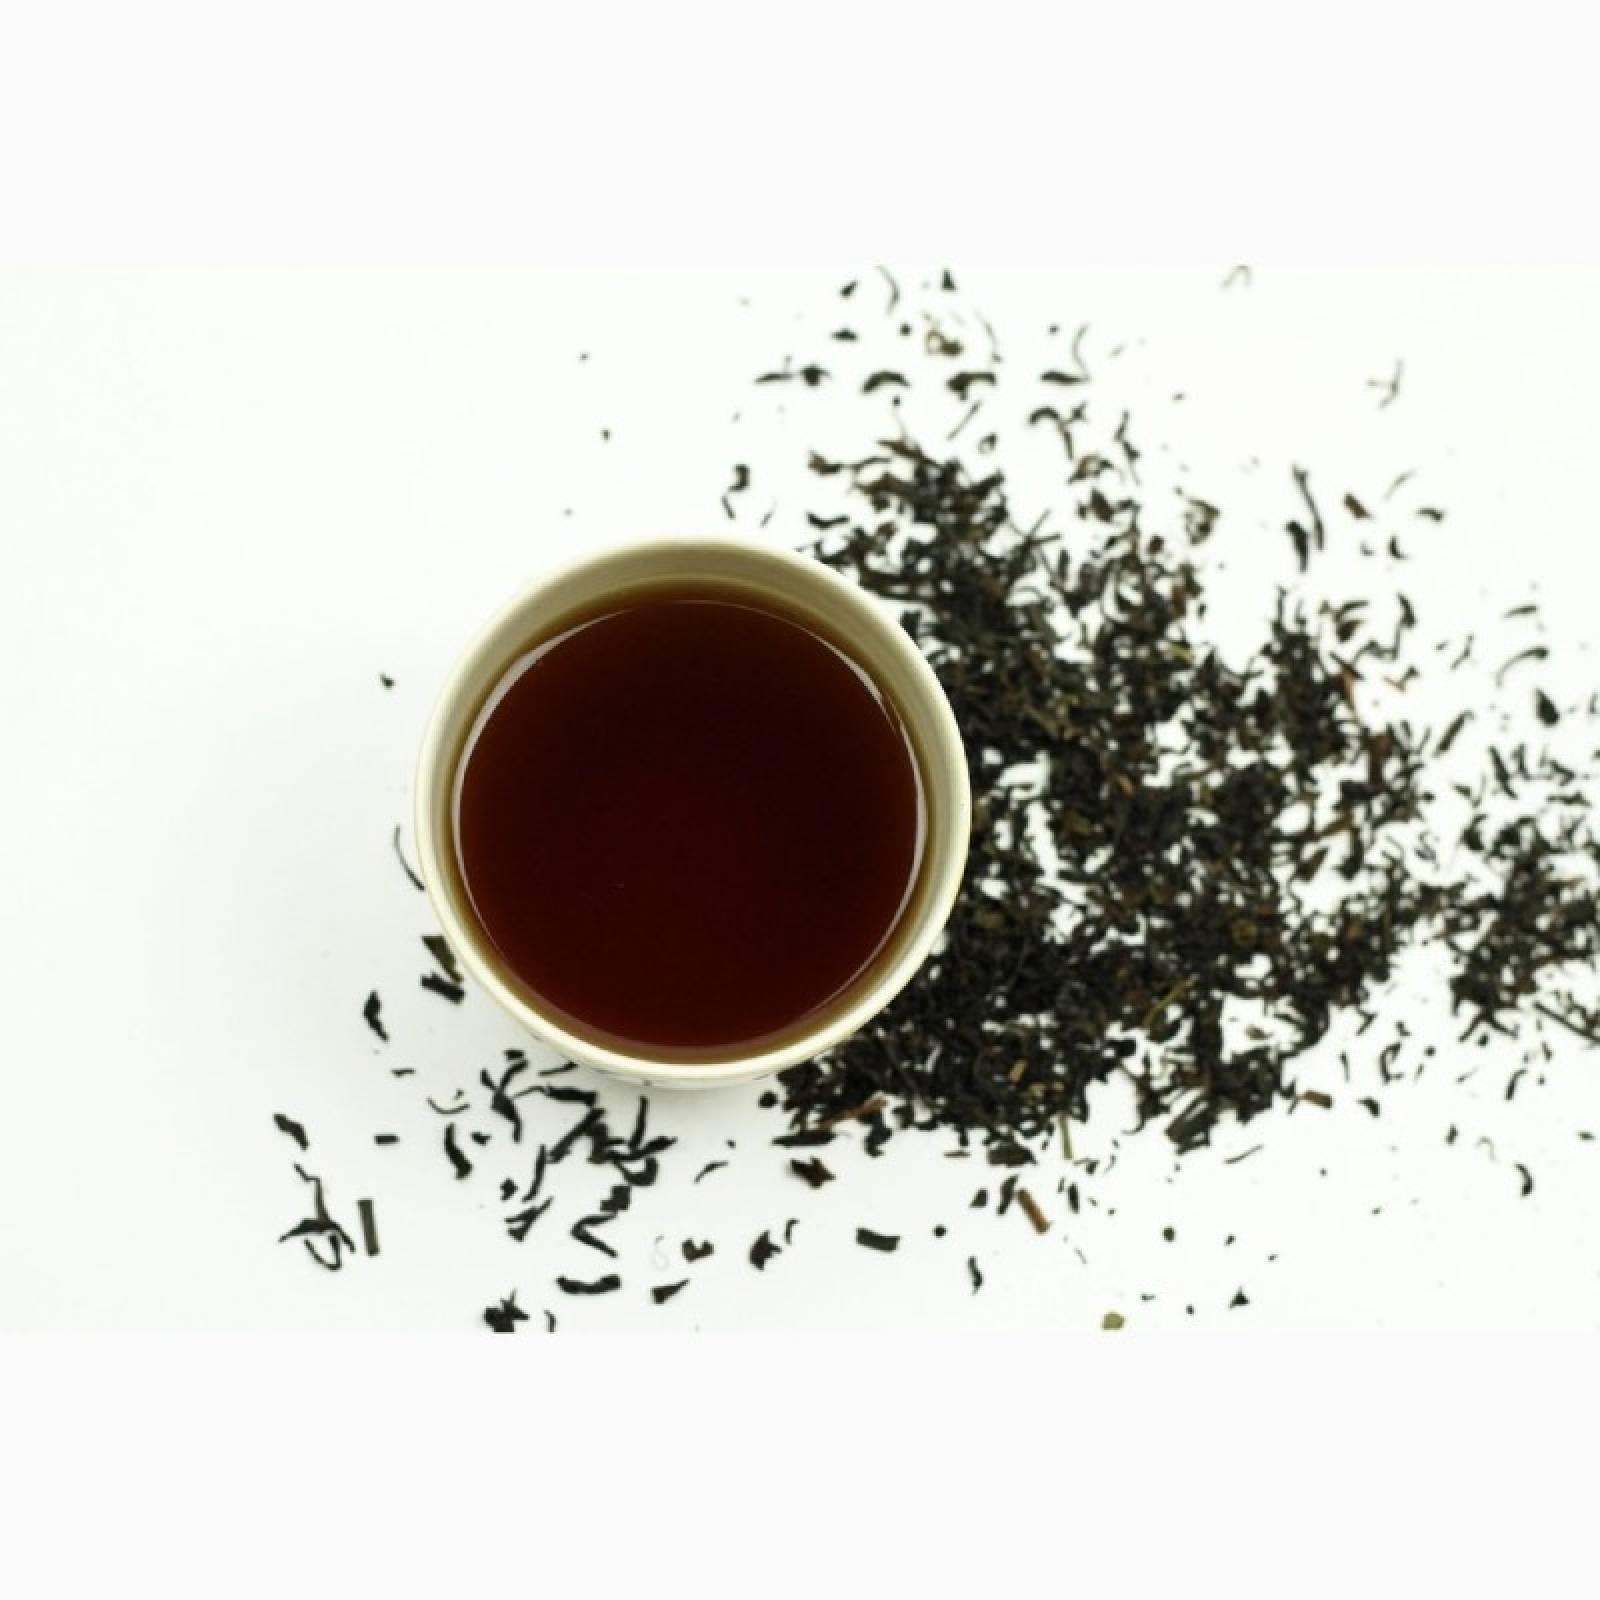 Tiosk Russian Caravan Loose Leaf Black Tea 100g thumbnails